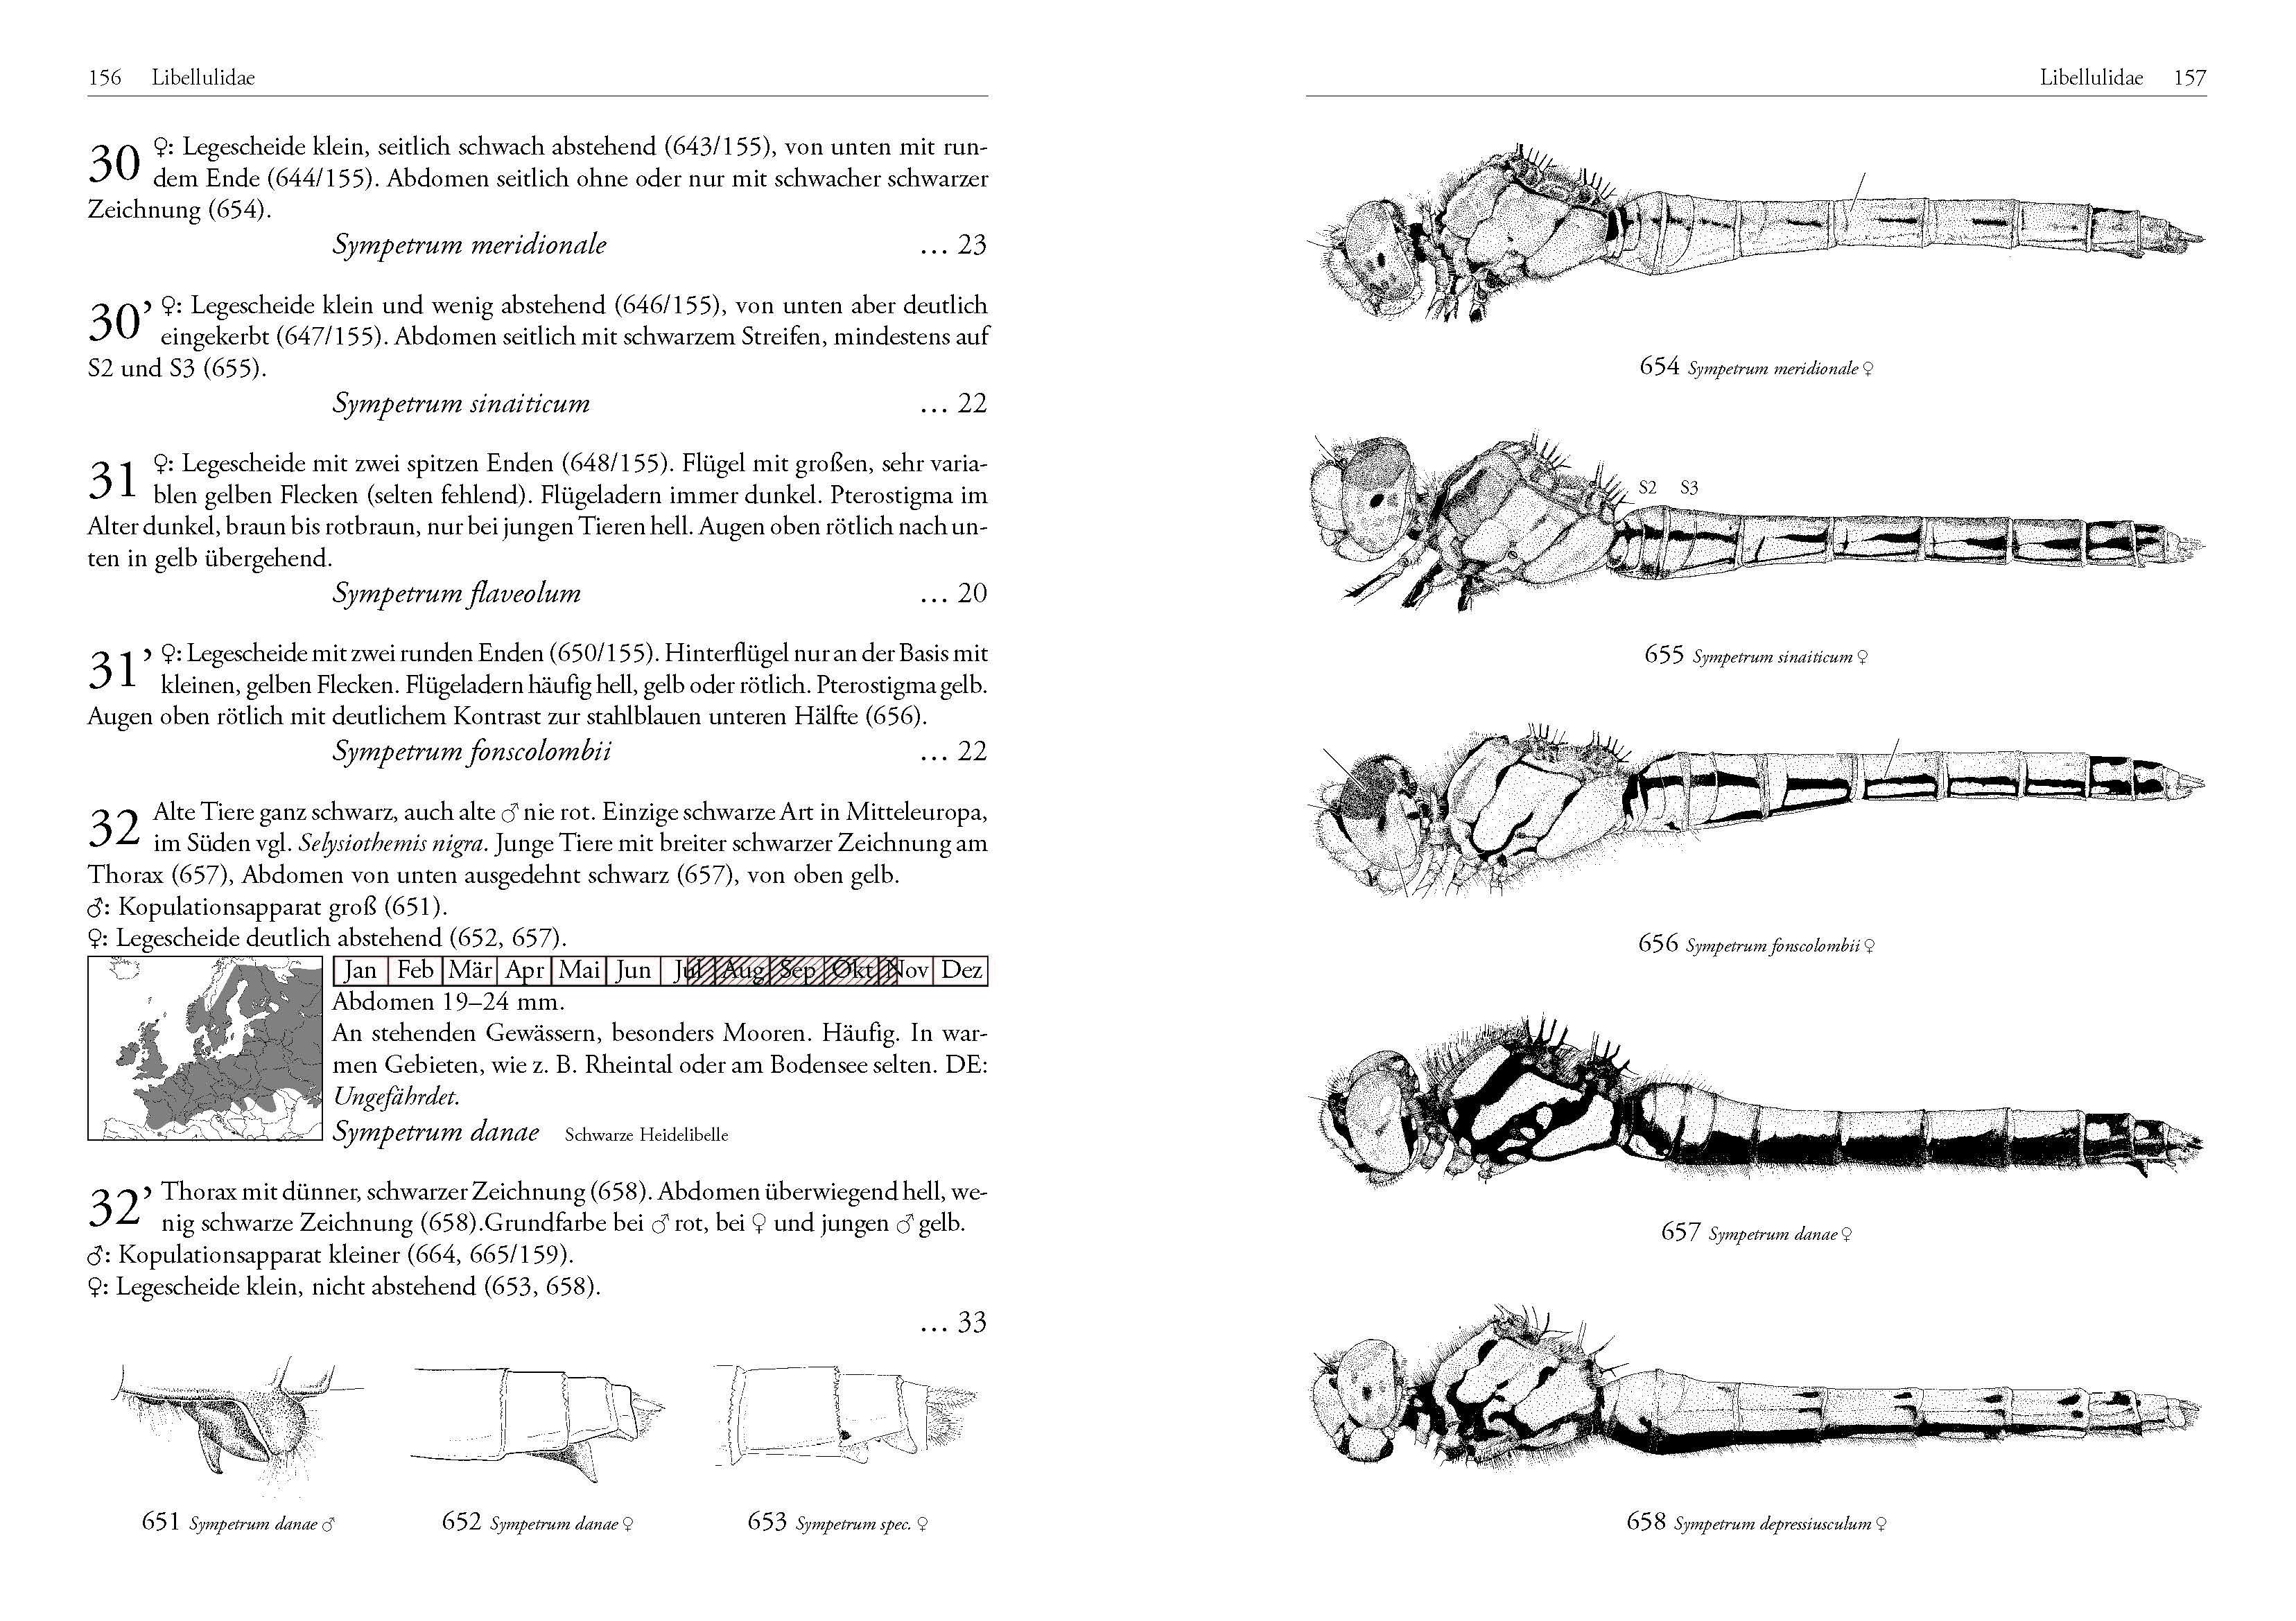 Leseprobe - DJN Libellen-Bestimmungsschlüssel Lehmann/Nüß, Seite 156/157